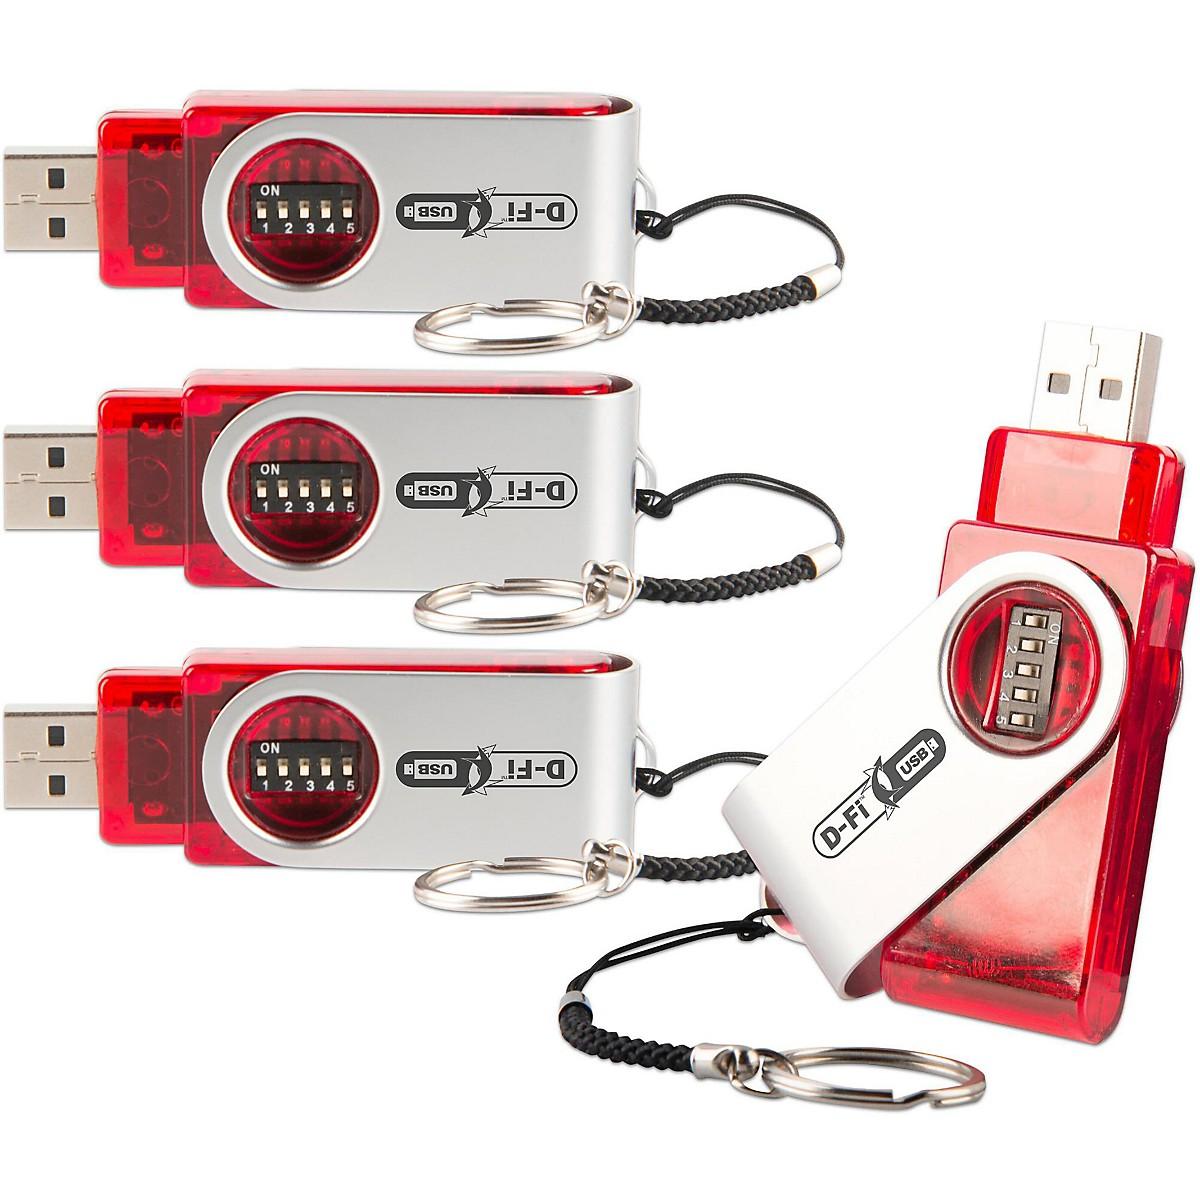 CHAUVET DJ D-FI USB 4PK Wireless USB Stage/Effect Light Controller 4-Pack